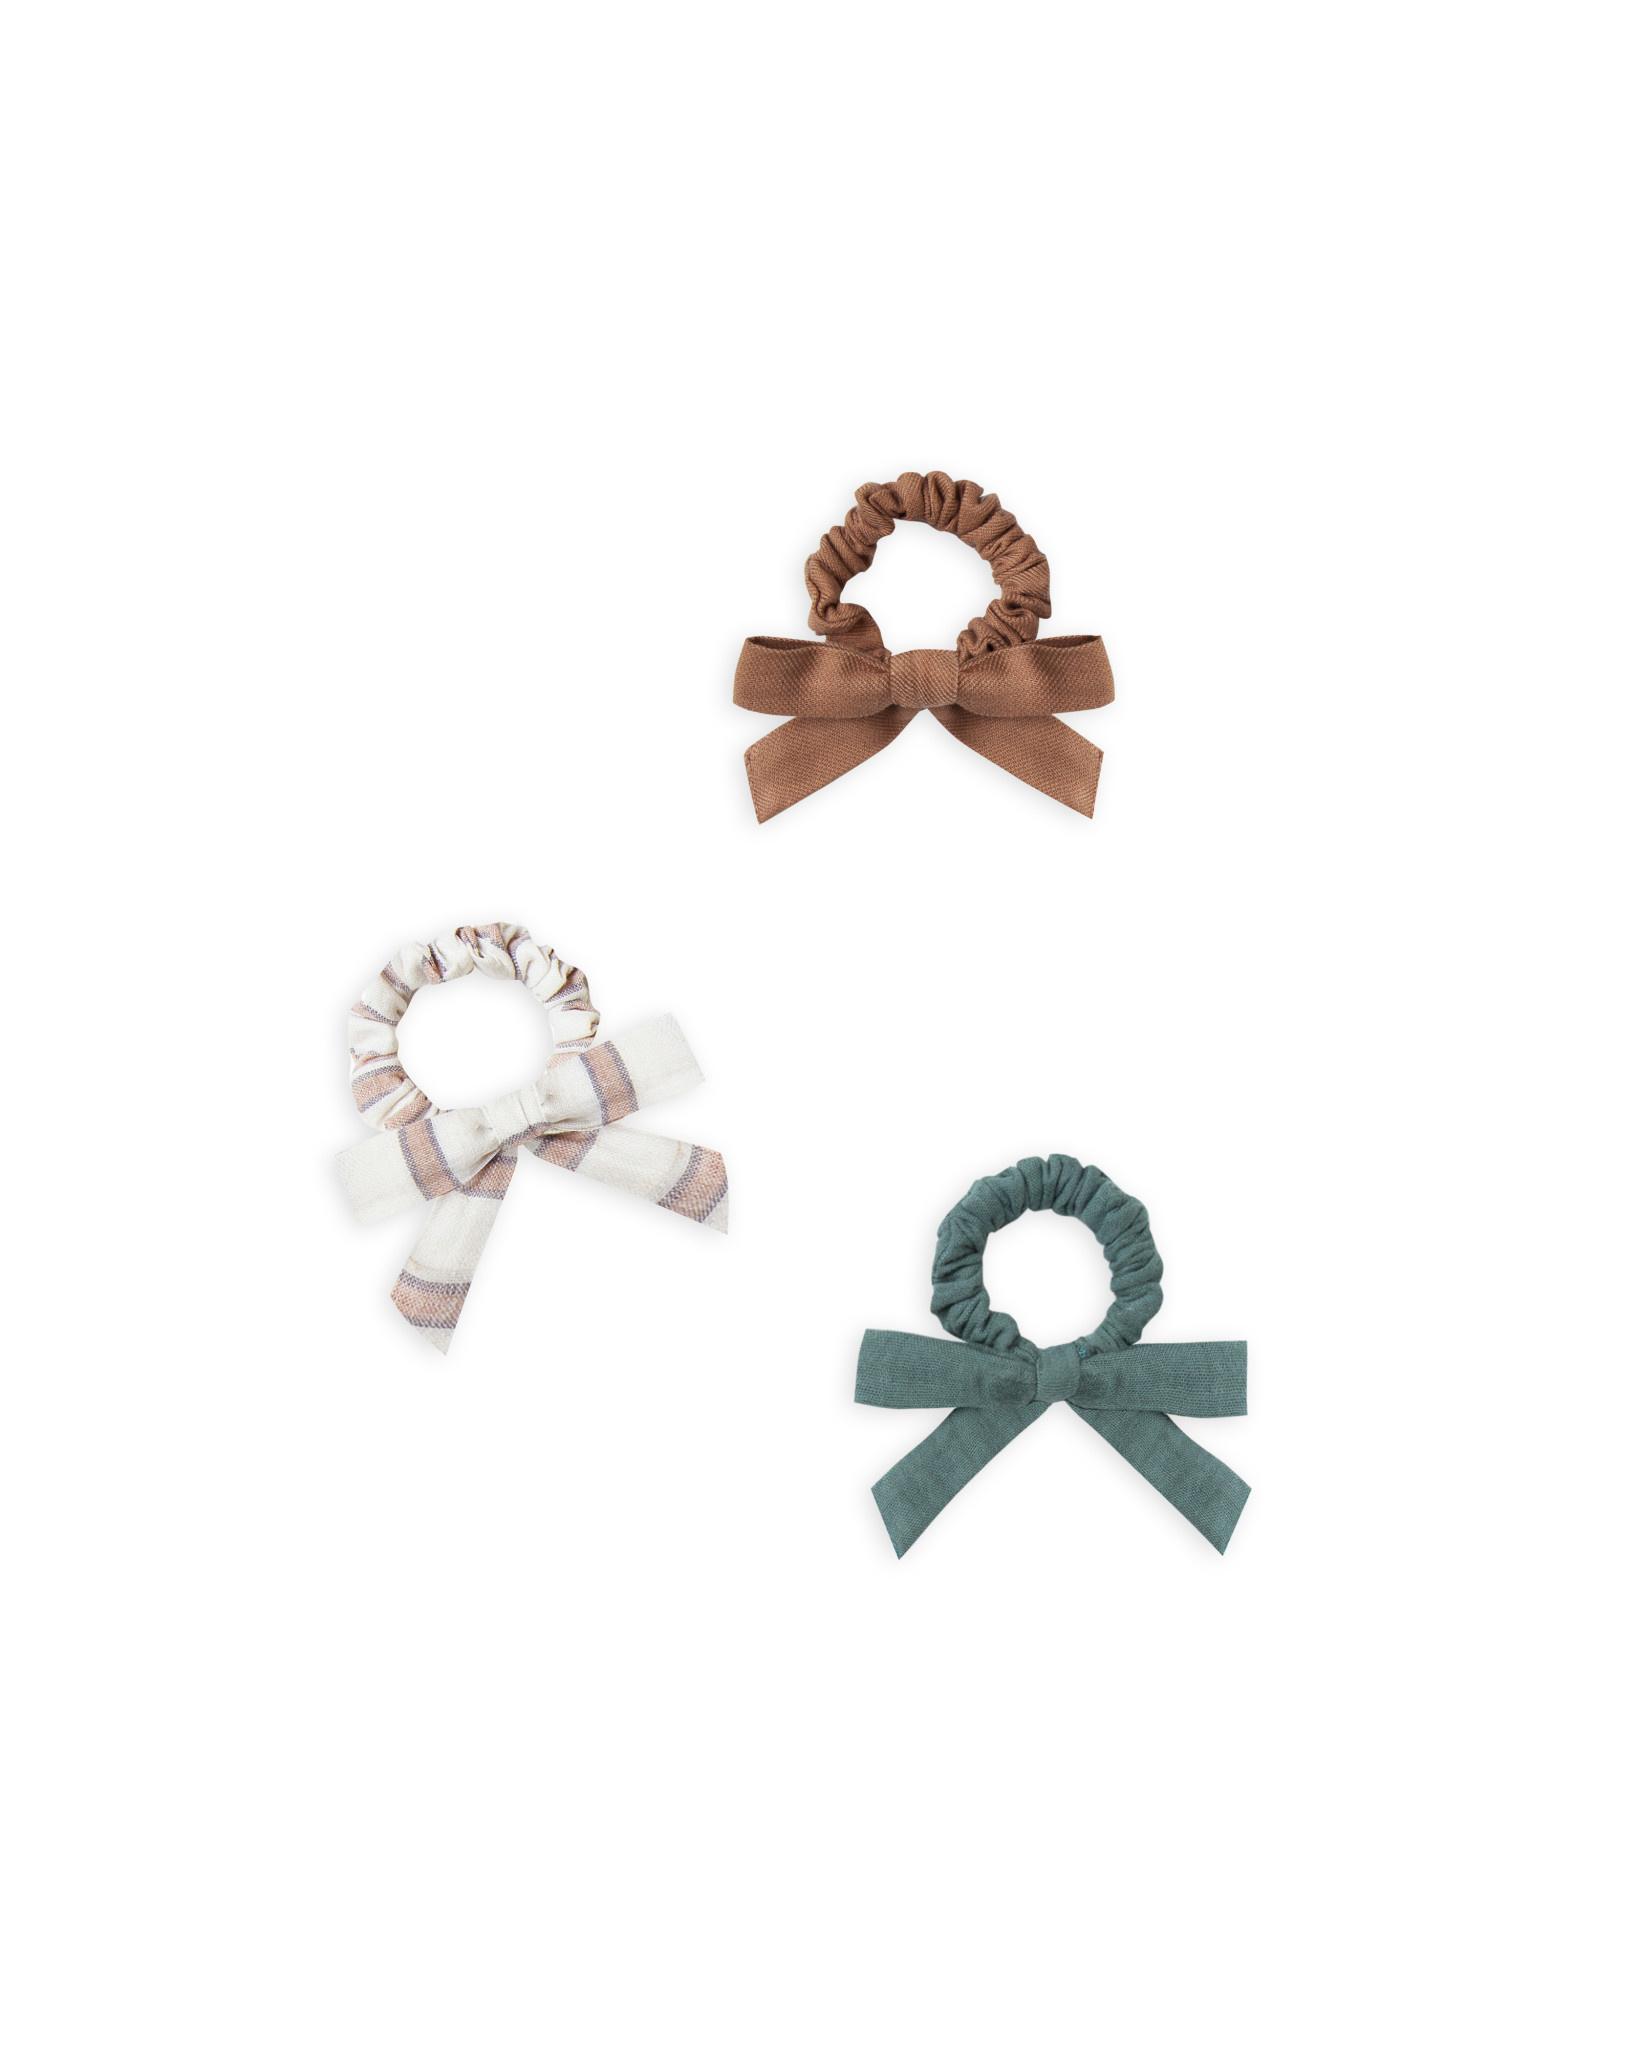 RYLEE AND CRU Little Bow Scrunchie Set- Caramel, Truffle Stripe, Spruce